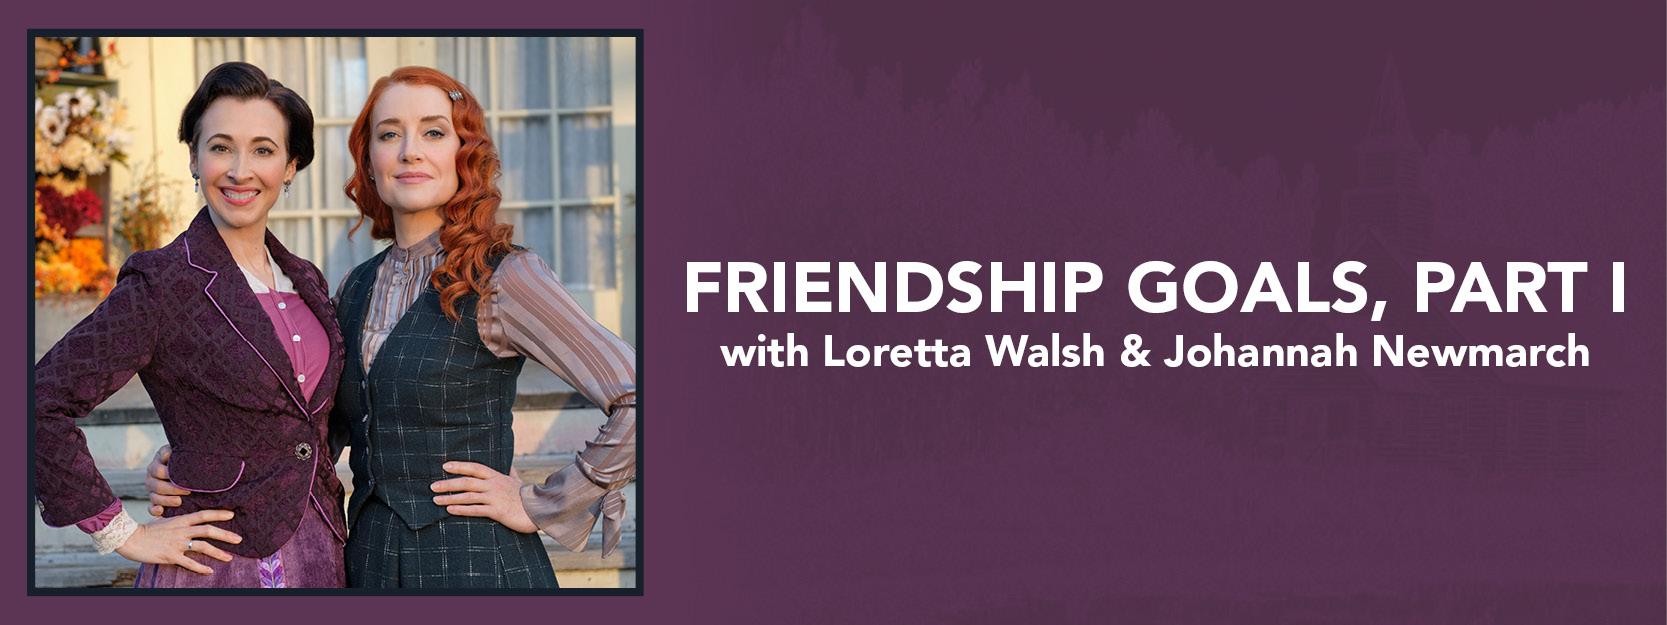 Friendship Goals with Loretta Walsh & Johannah Newmarch, Part I